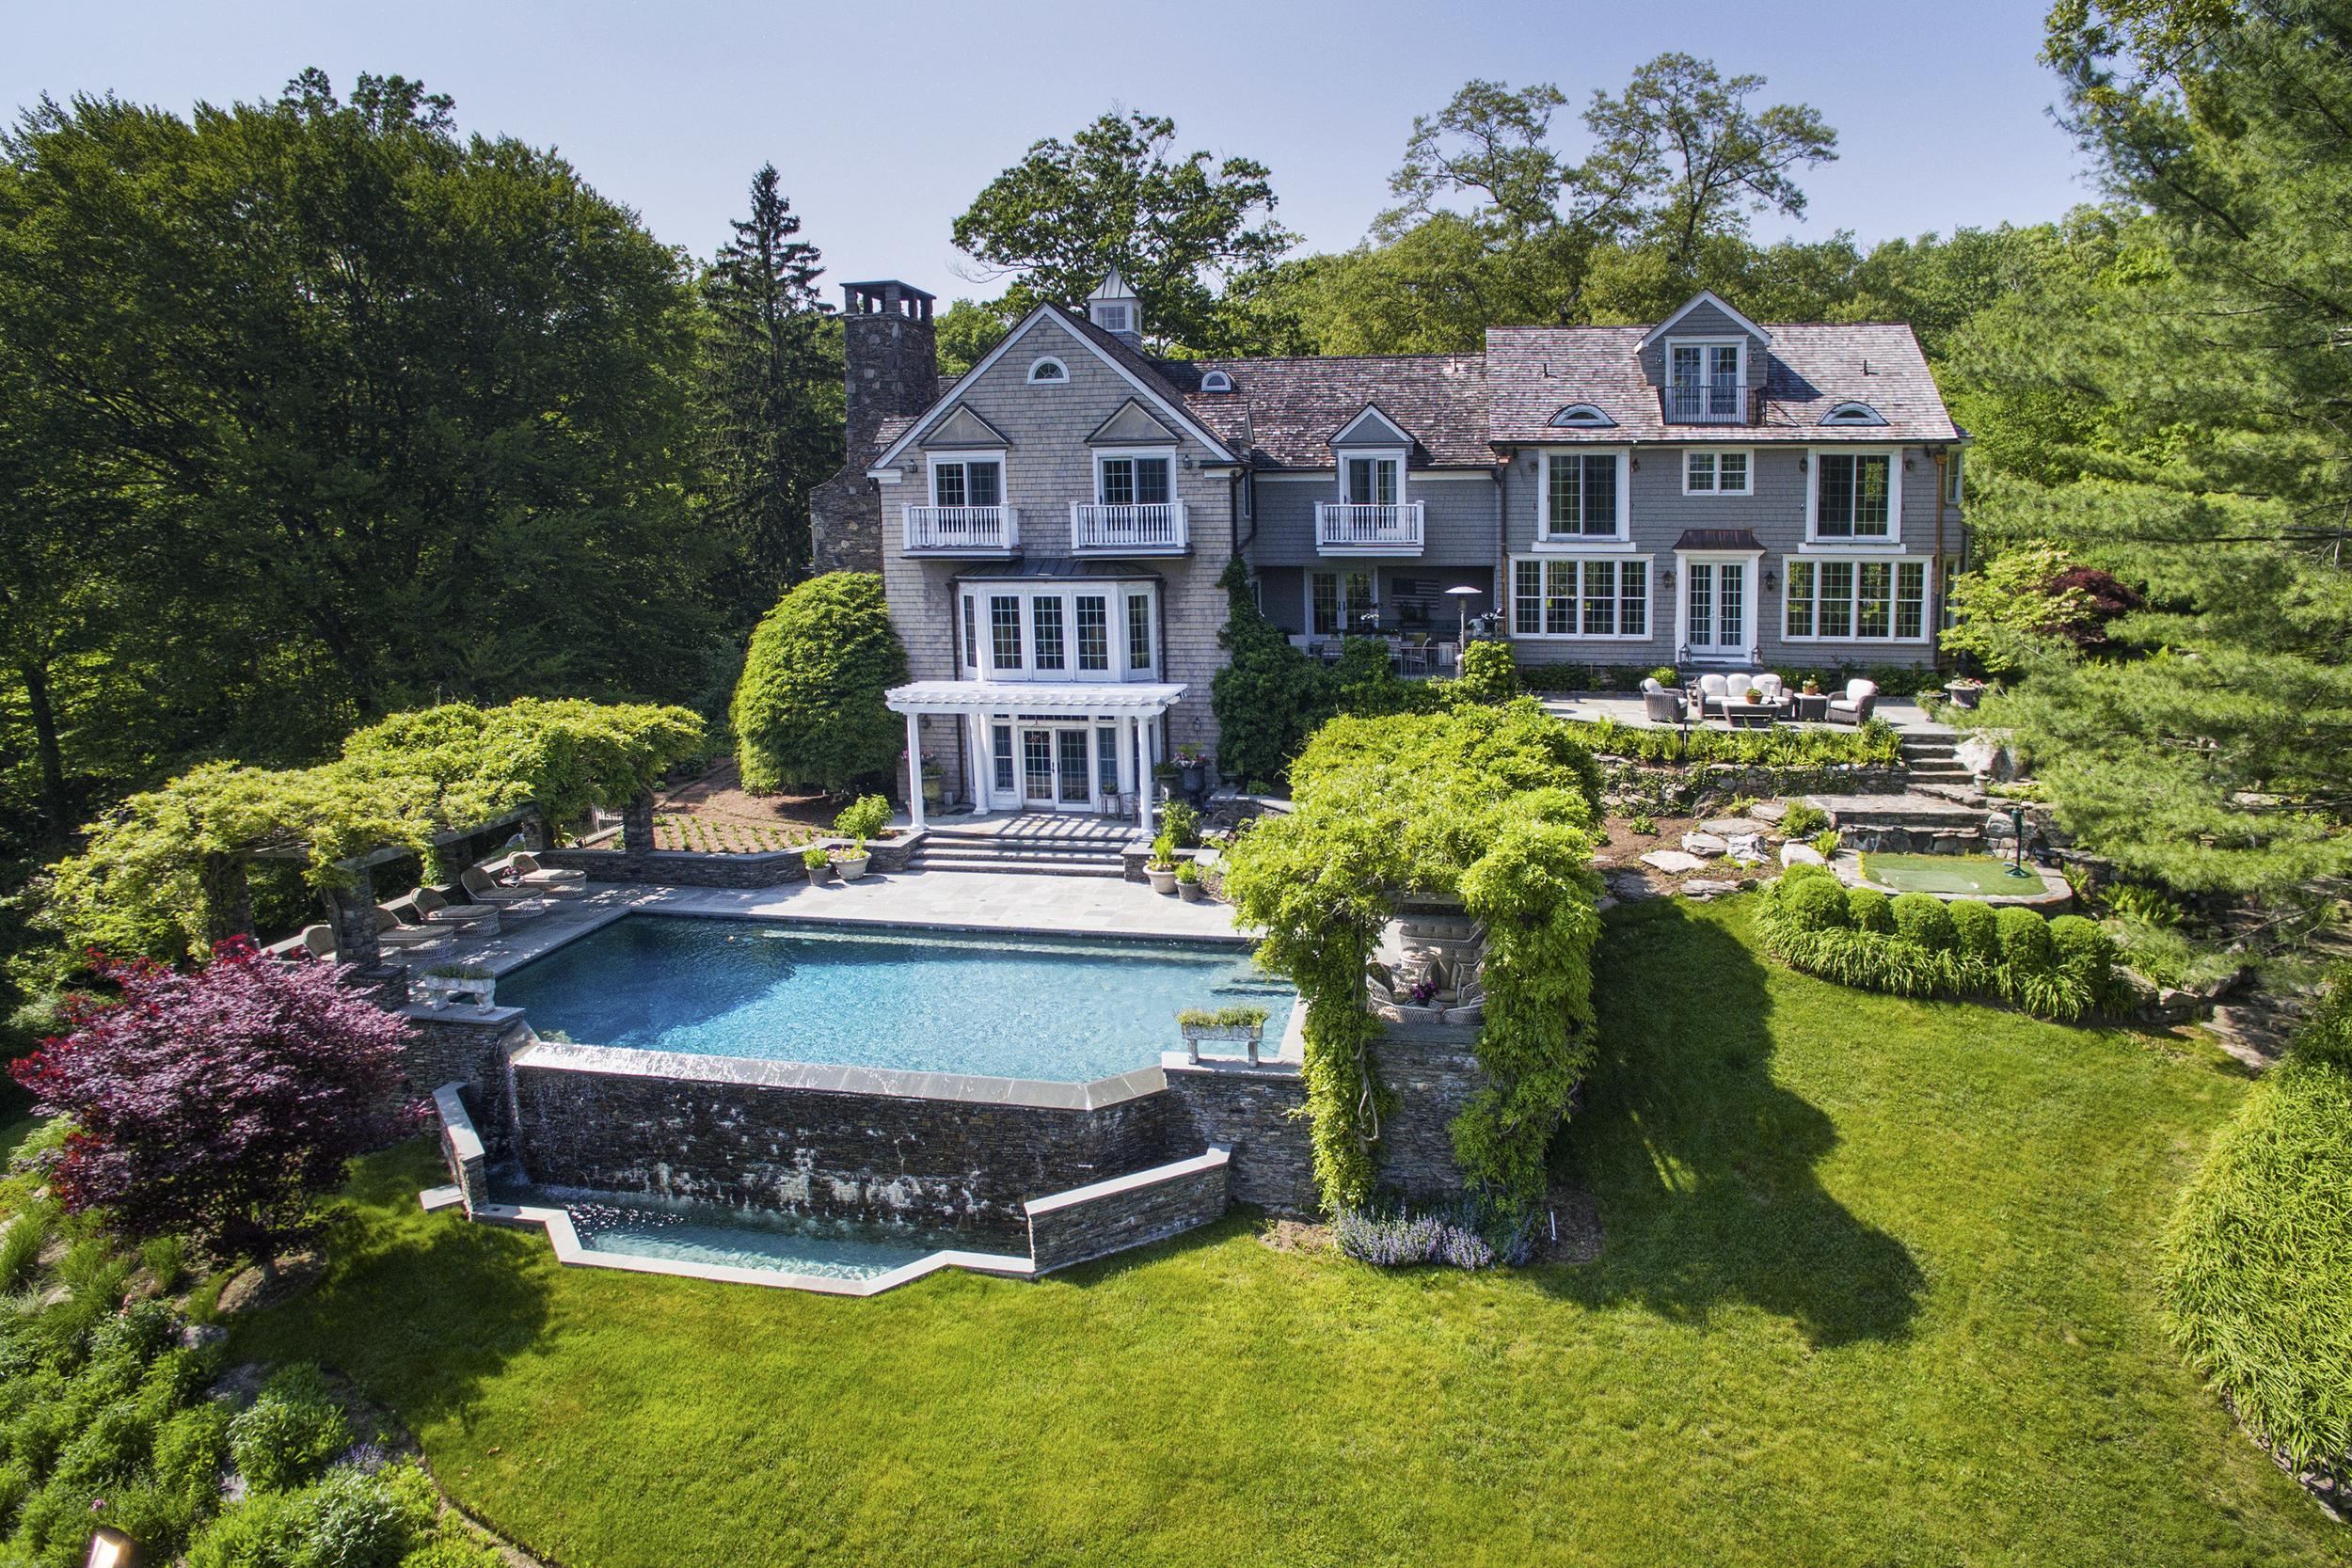 181 Mead St. - Waccabuc, NY - $15,985,000